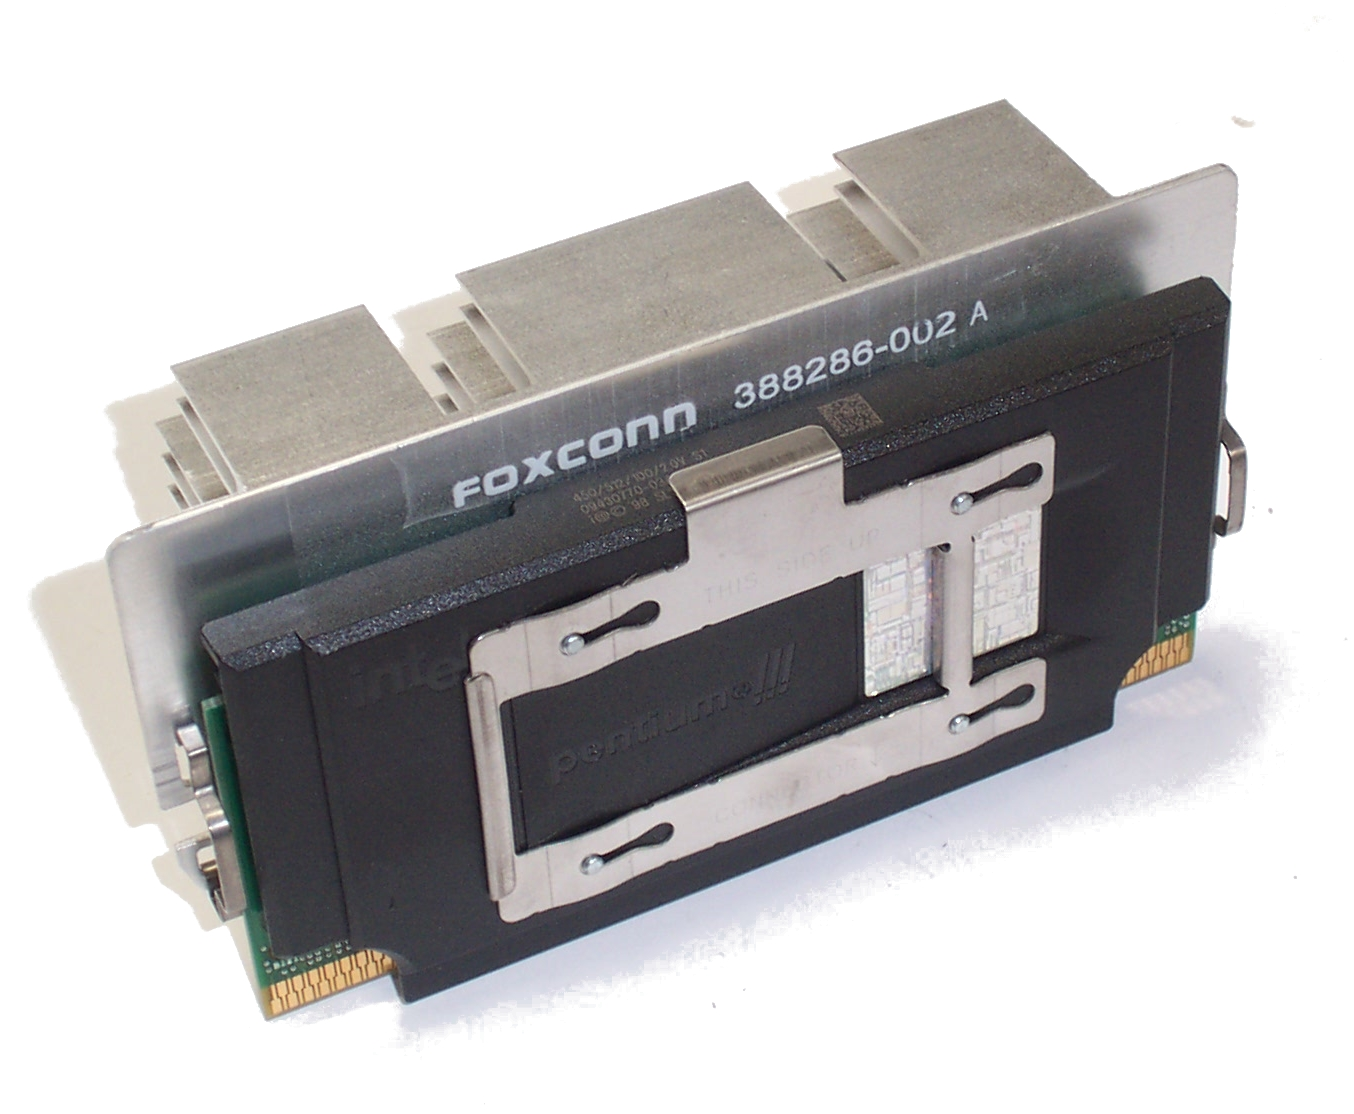 Intel SL35D Pentium 3 450MHz Slot 1 Processor with HP 388286-002 Heatsink